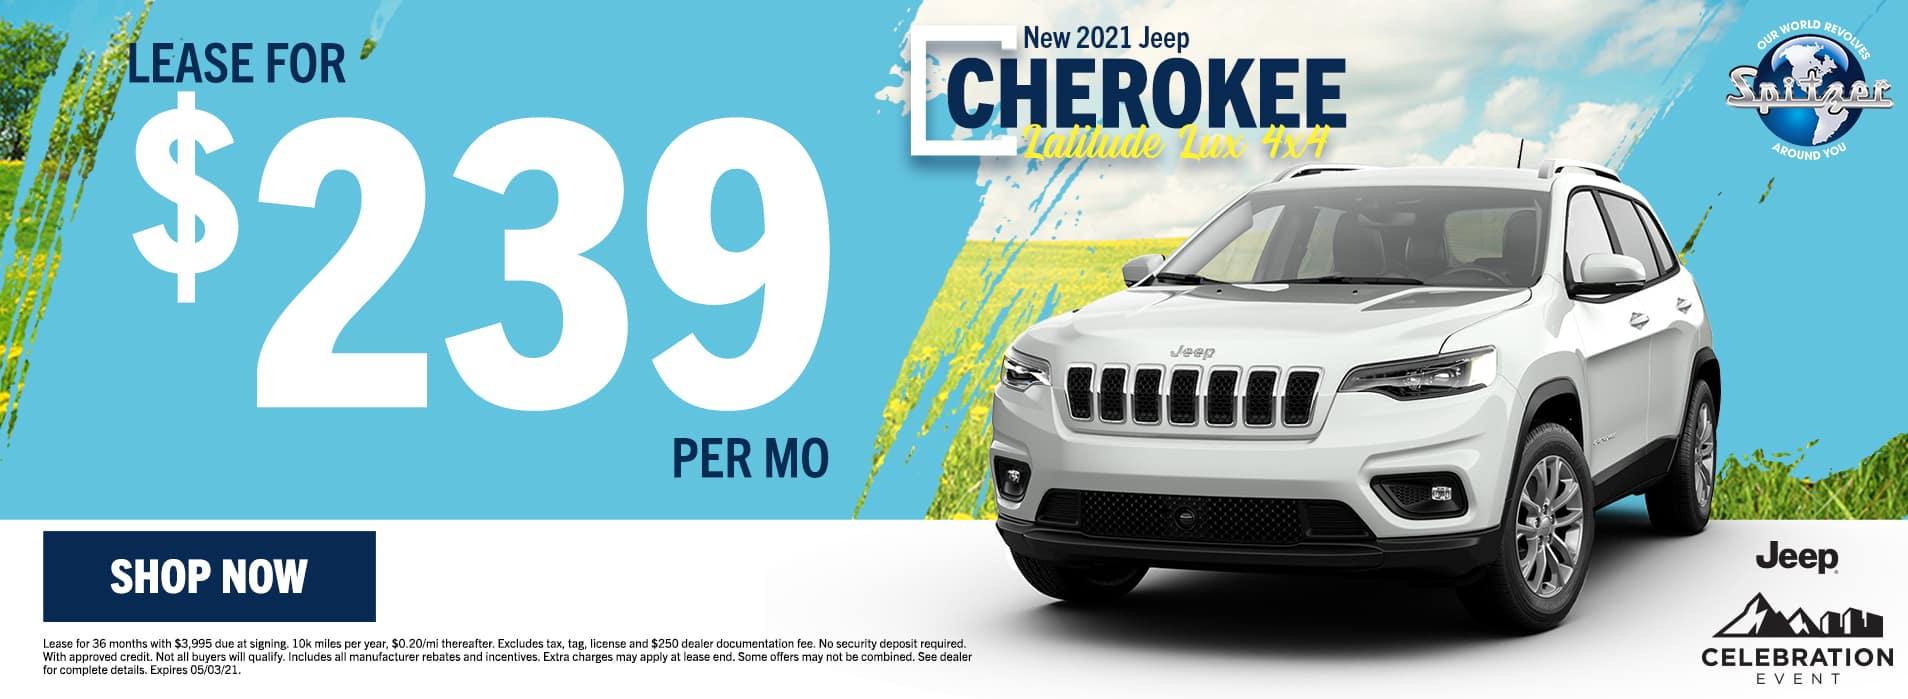 047-0421-SCO5101_SL_Cherokee